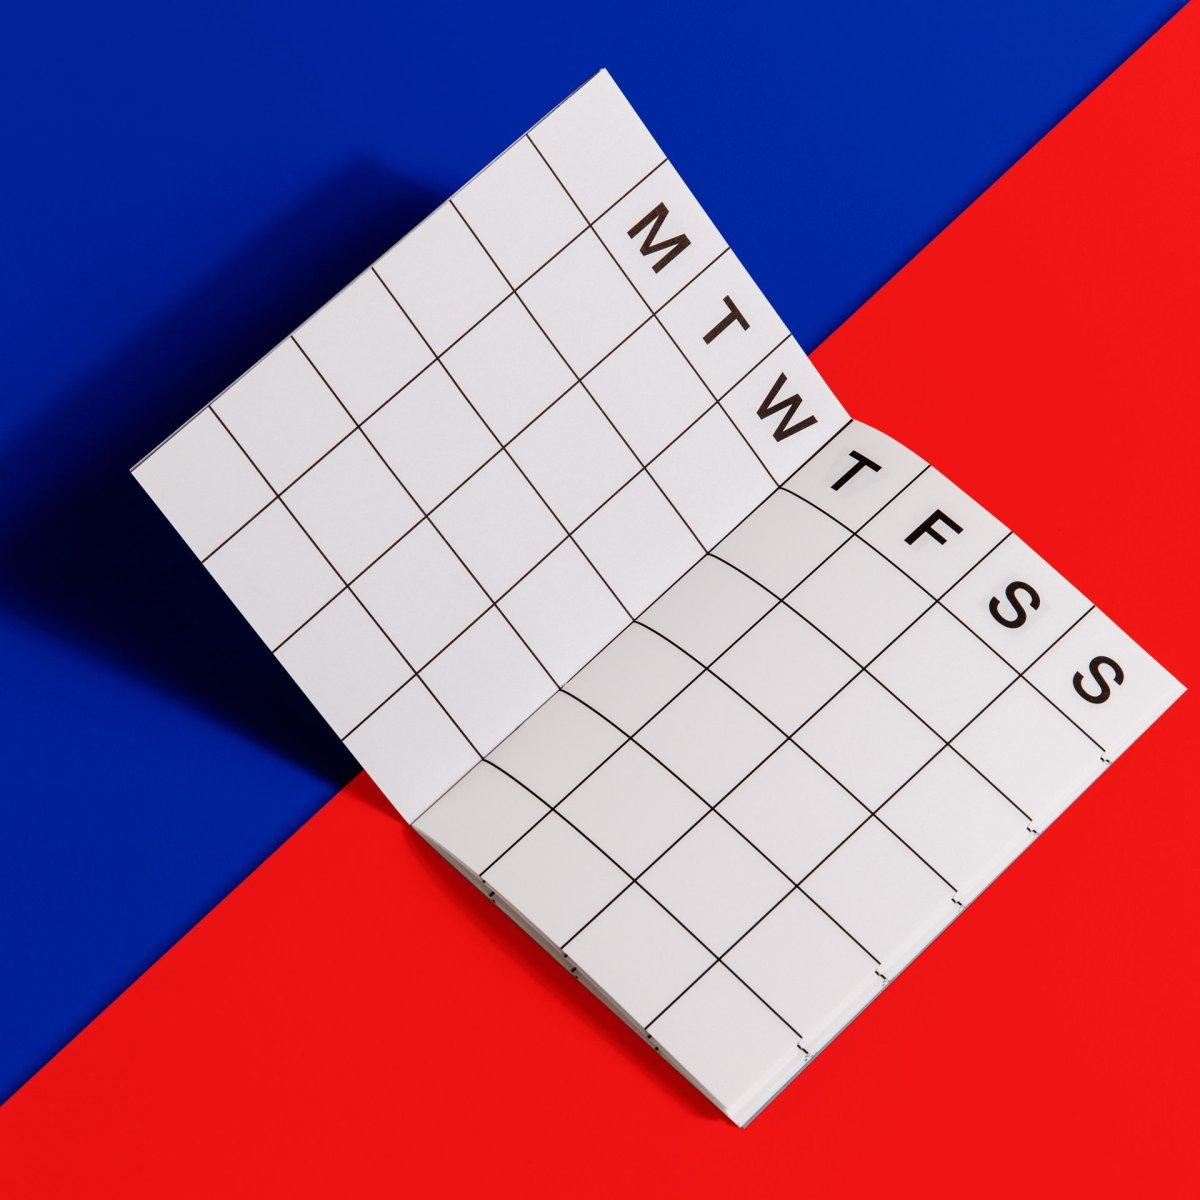 2020 Calendars + Planners